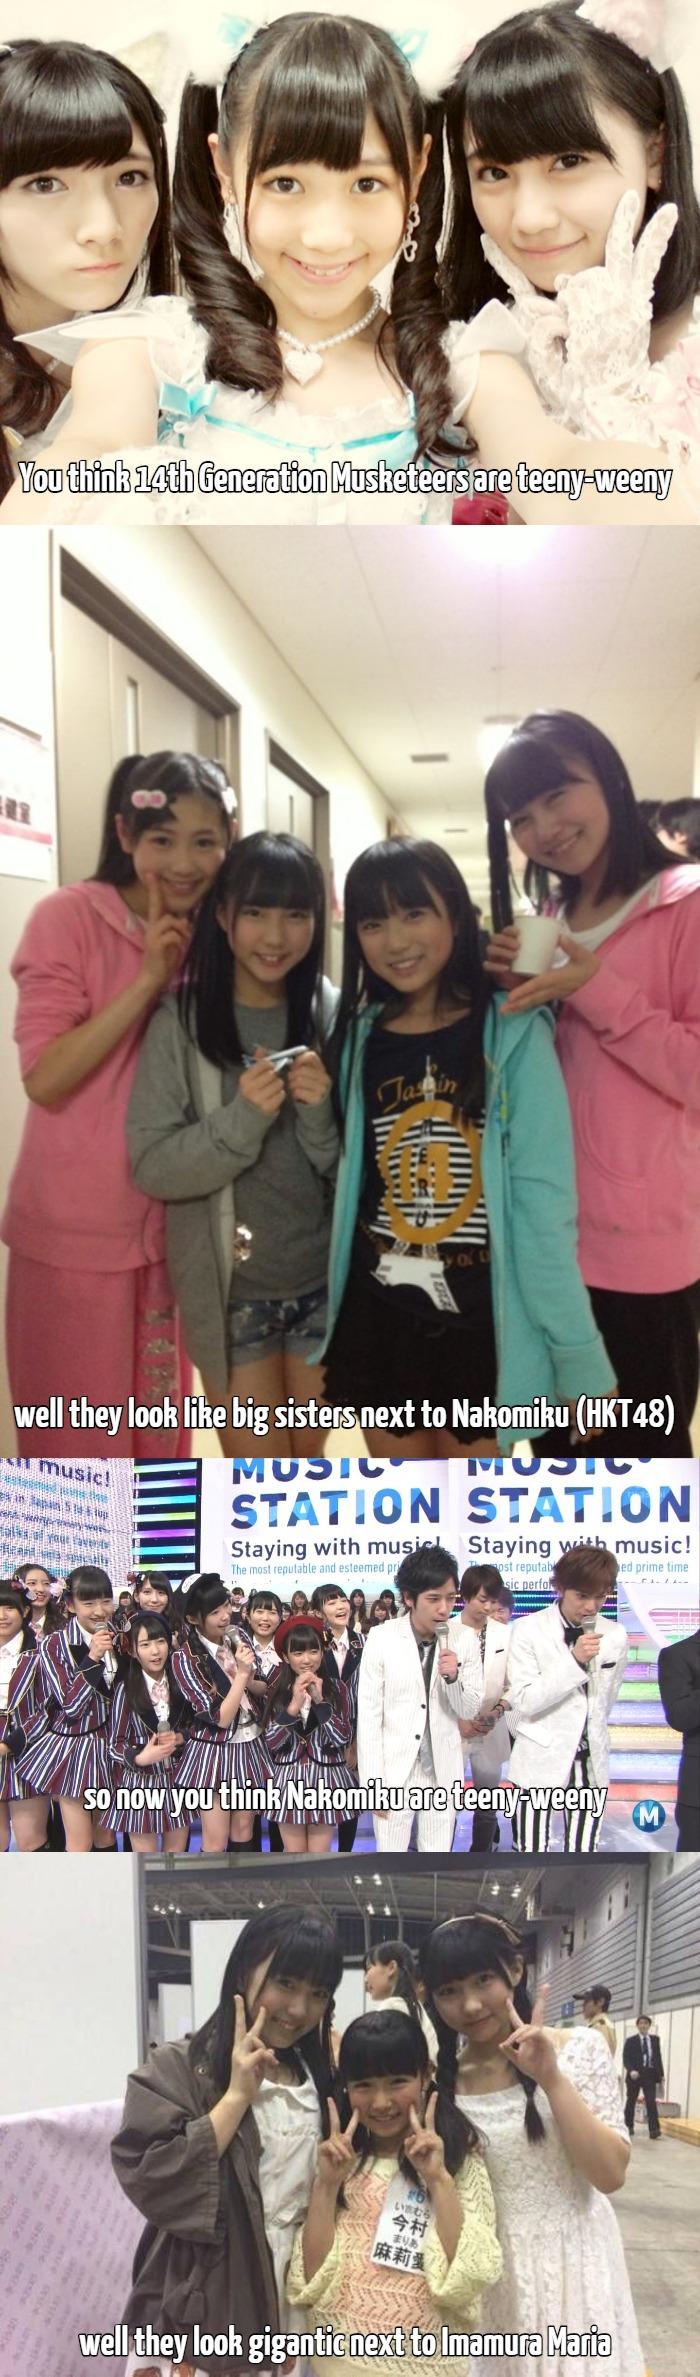 height akb48 girls kojima mako nako miku mikichan.jpg